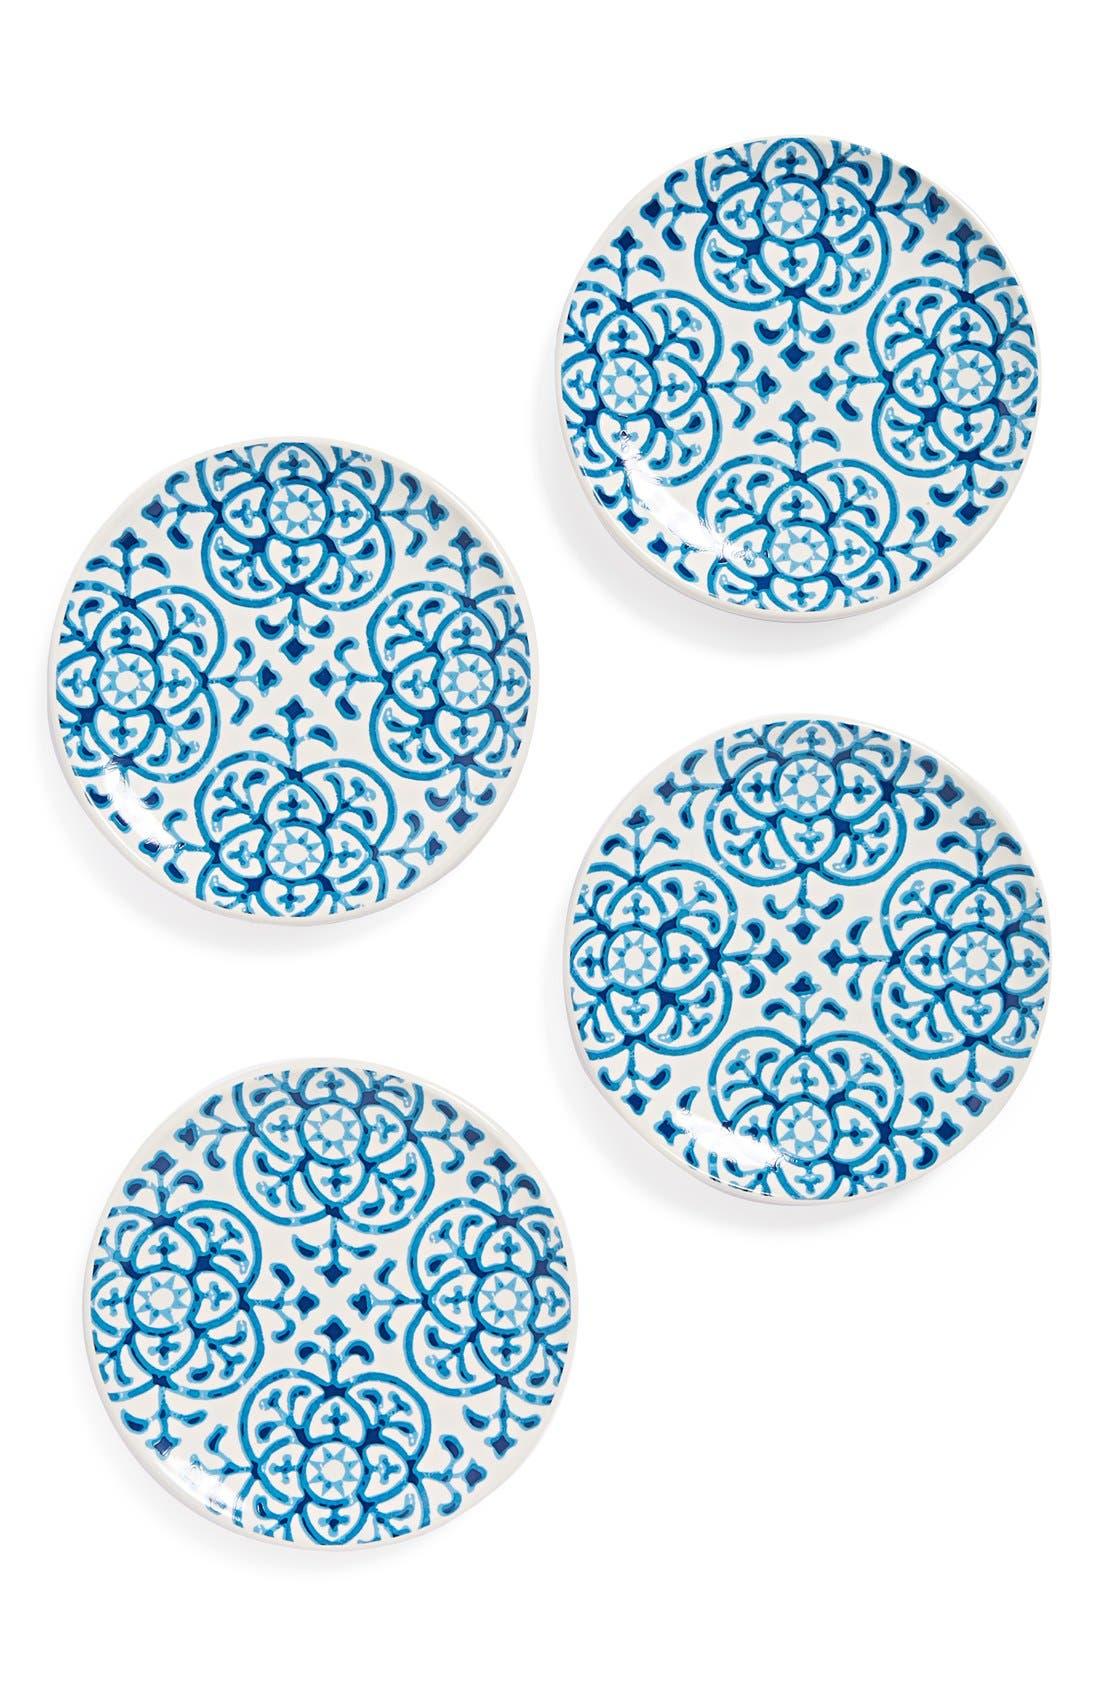 Main Image - Signature Housewares Indigo Tile Plates (Set of 4)